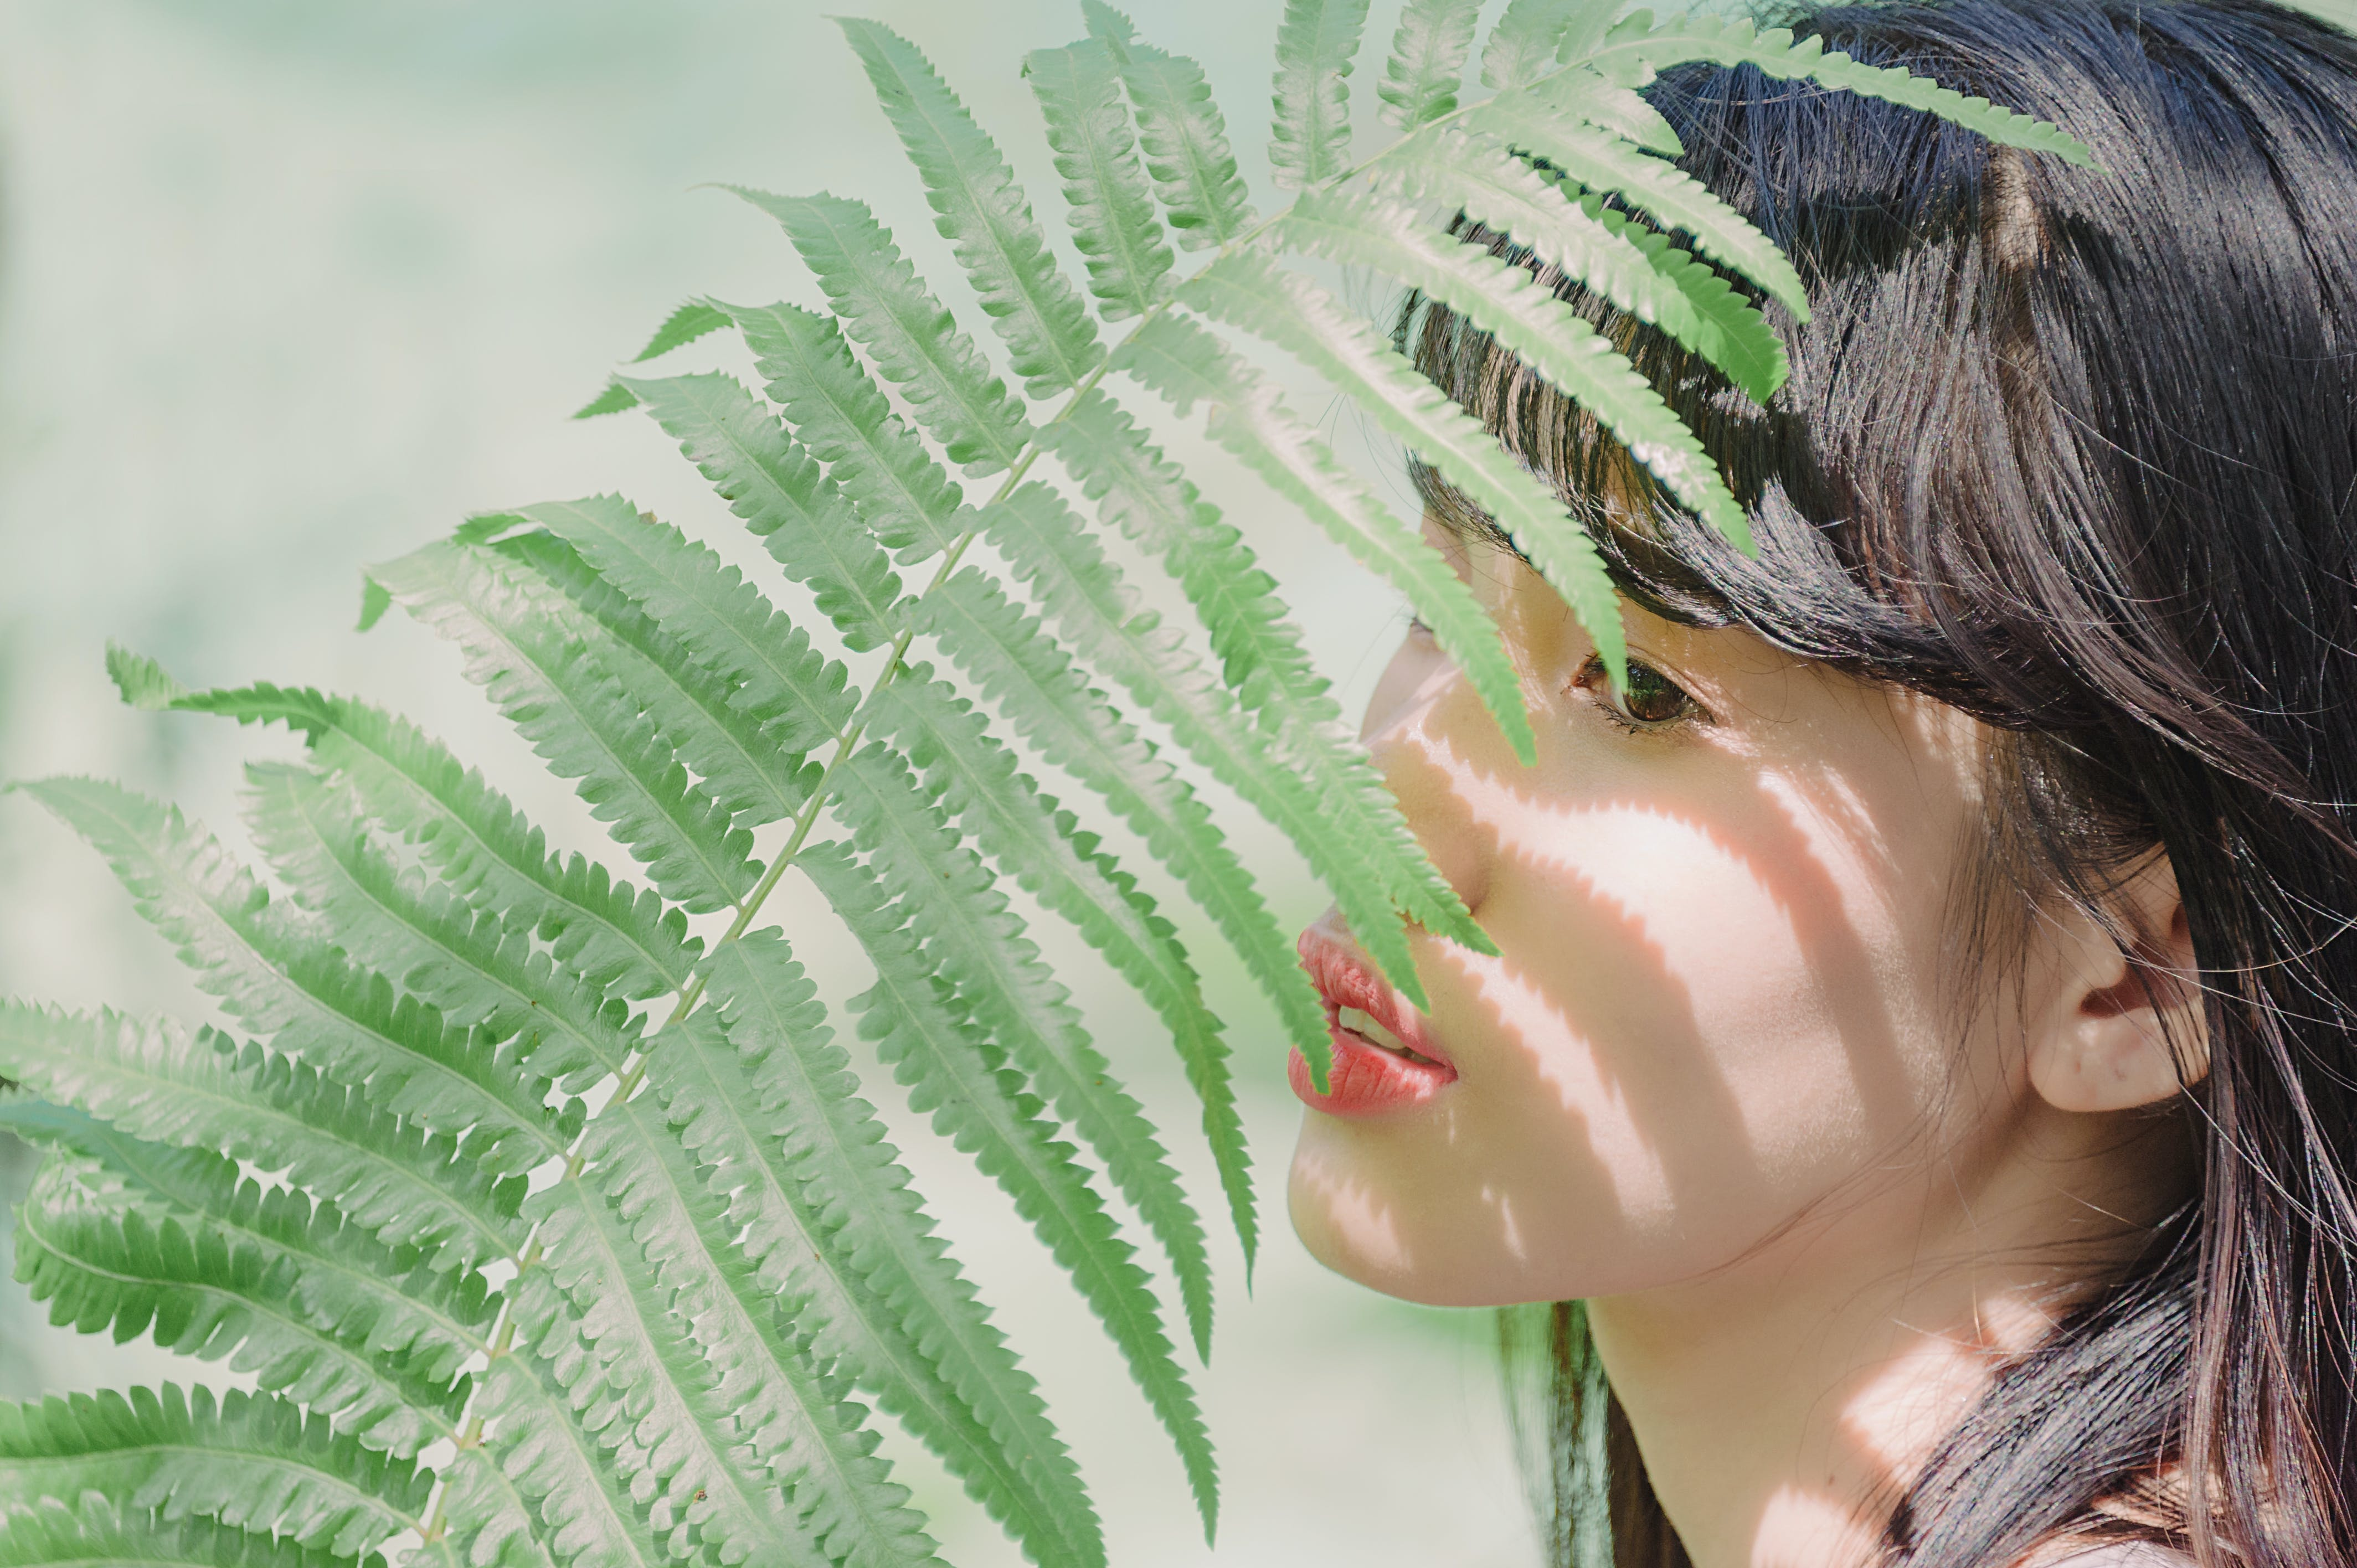 Close-Up Photography of Woman Near Fern